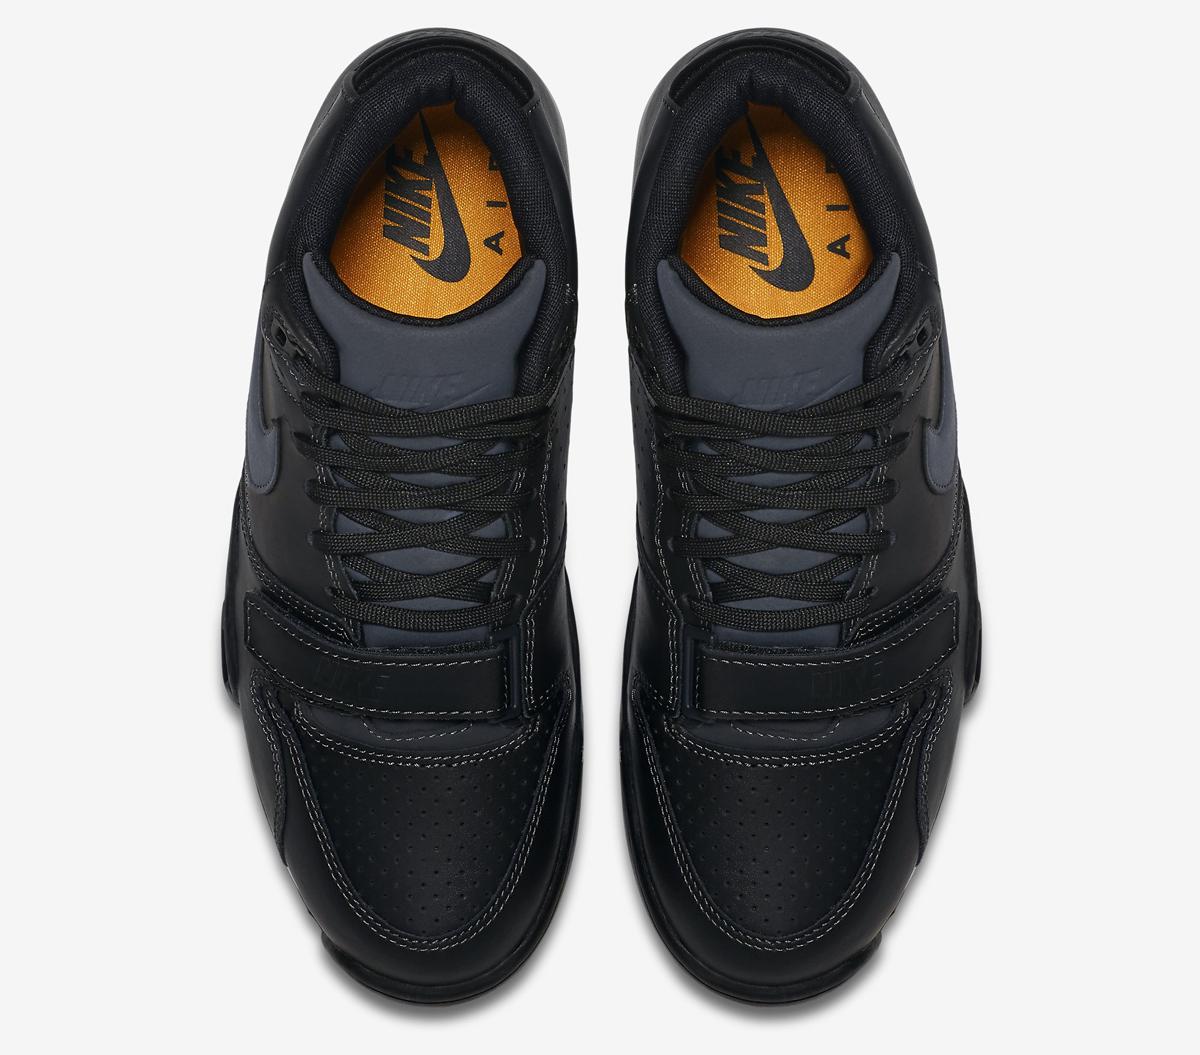 quality design d3242 e4305 Nike Air Trainer 1 Mid Color  Anthracite Anthracite-Black-Laser Orange  Style    317554-004